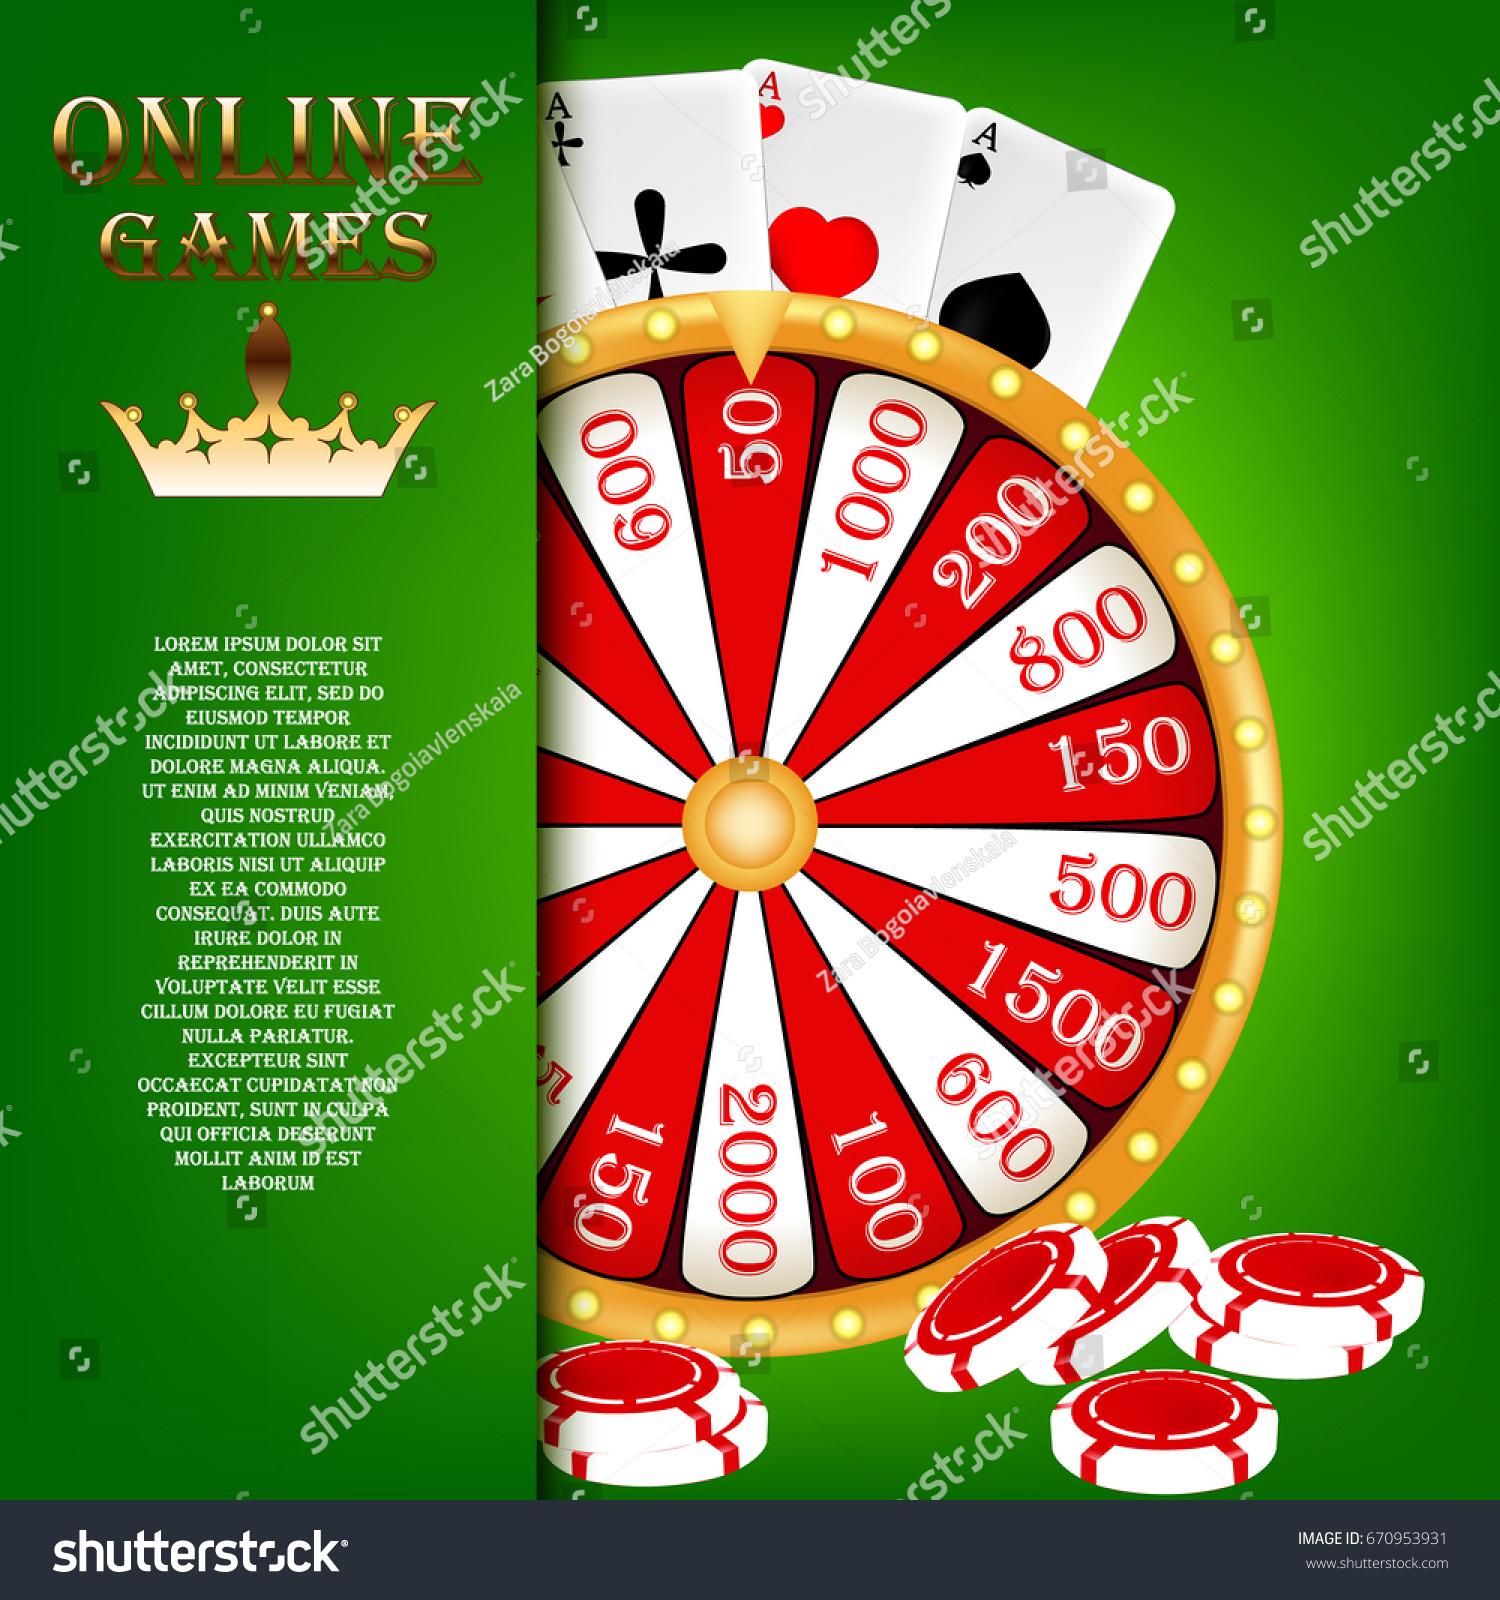 Screensaver Online Gambling Wheel Fortune Casino Stock Vector Royalty Free 670953931